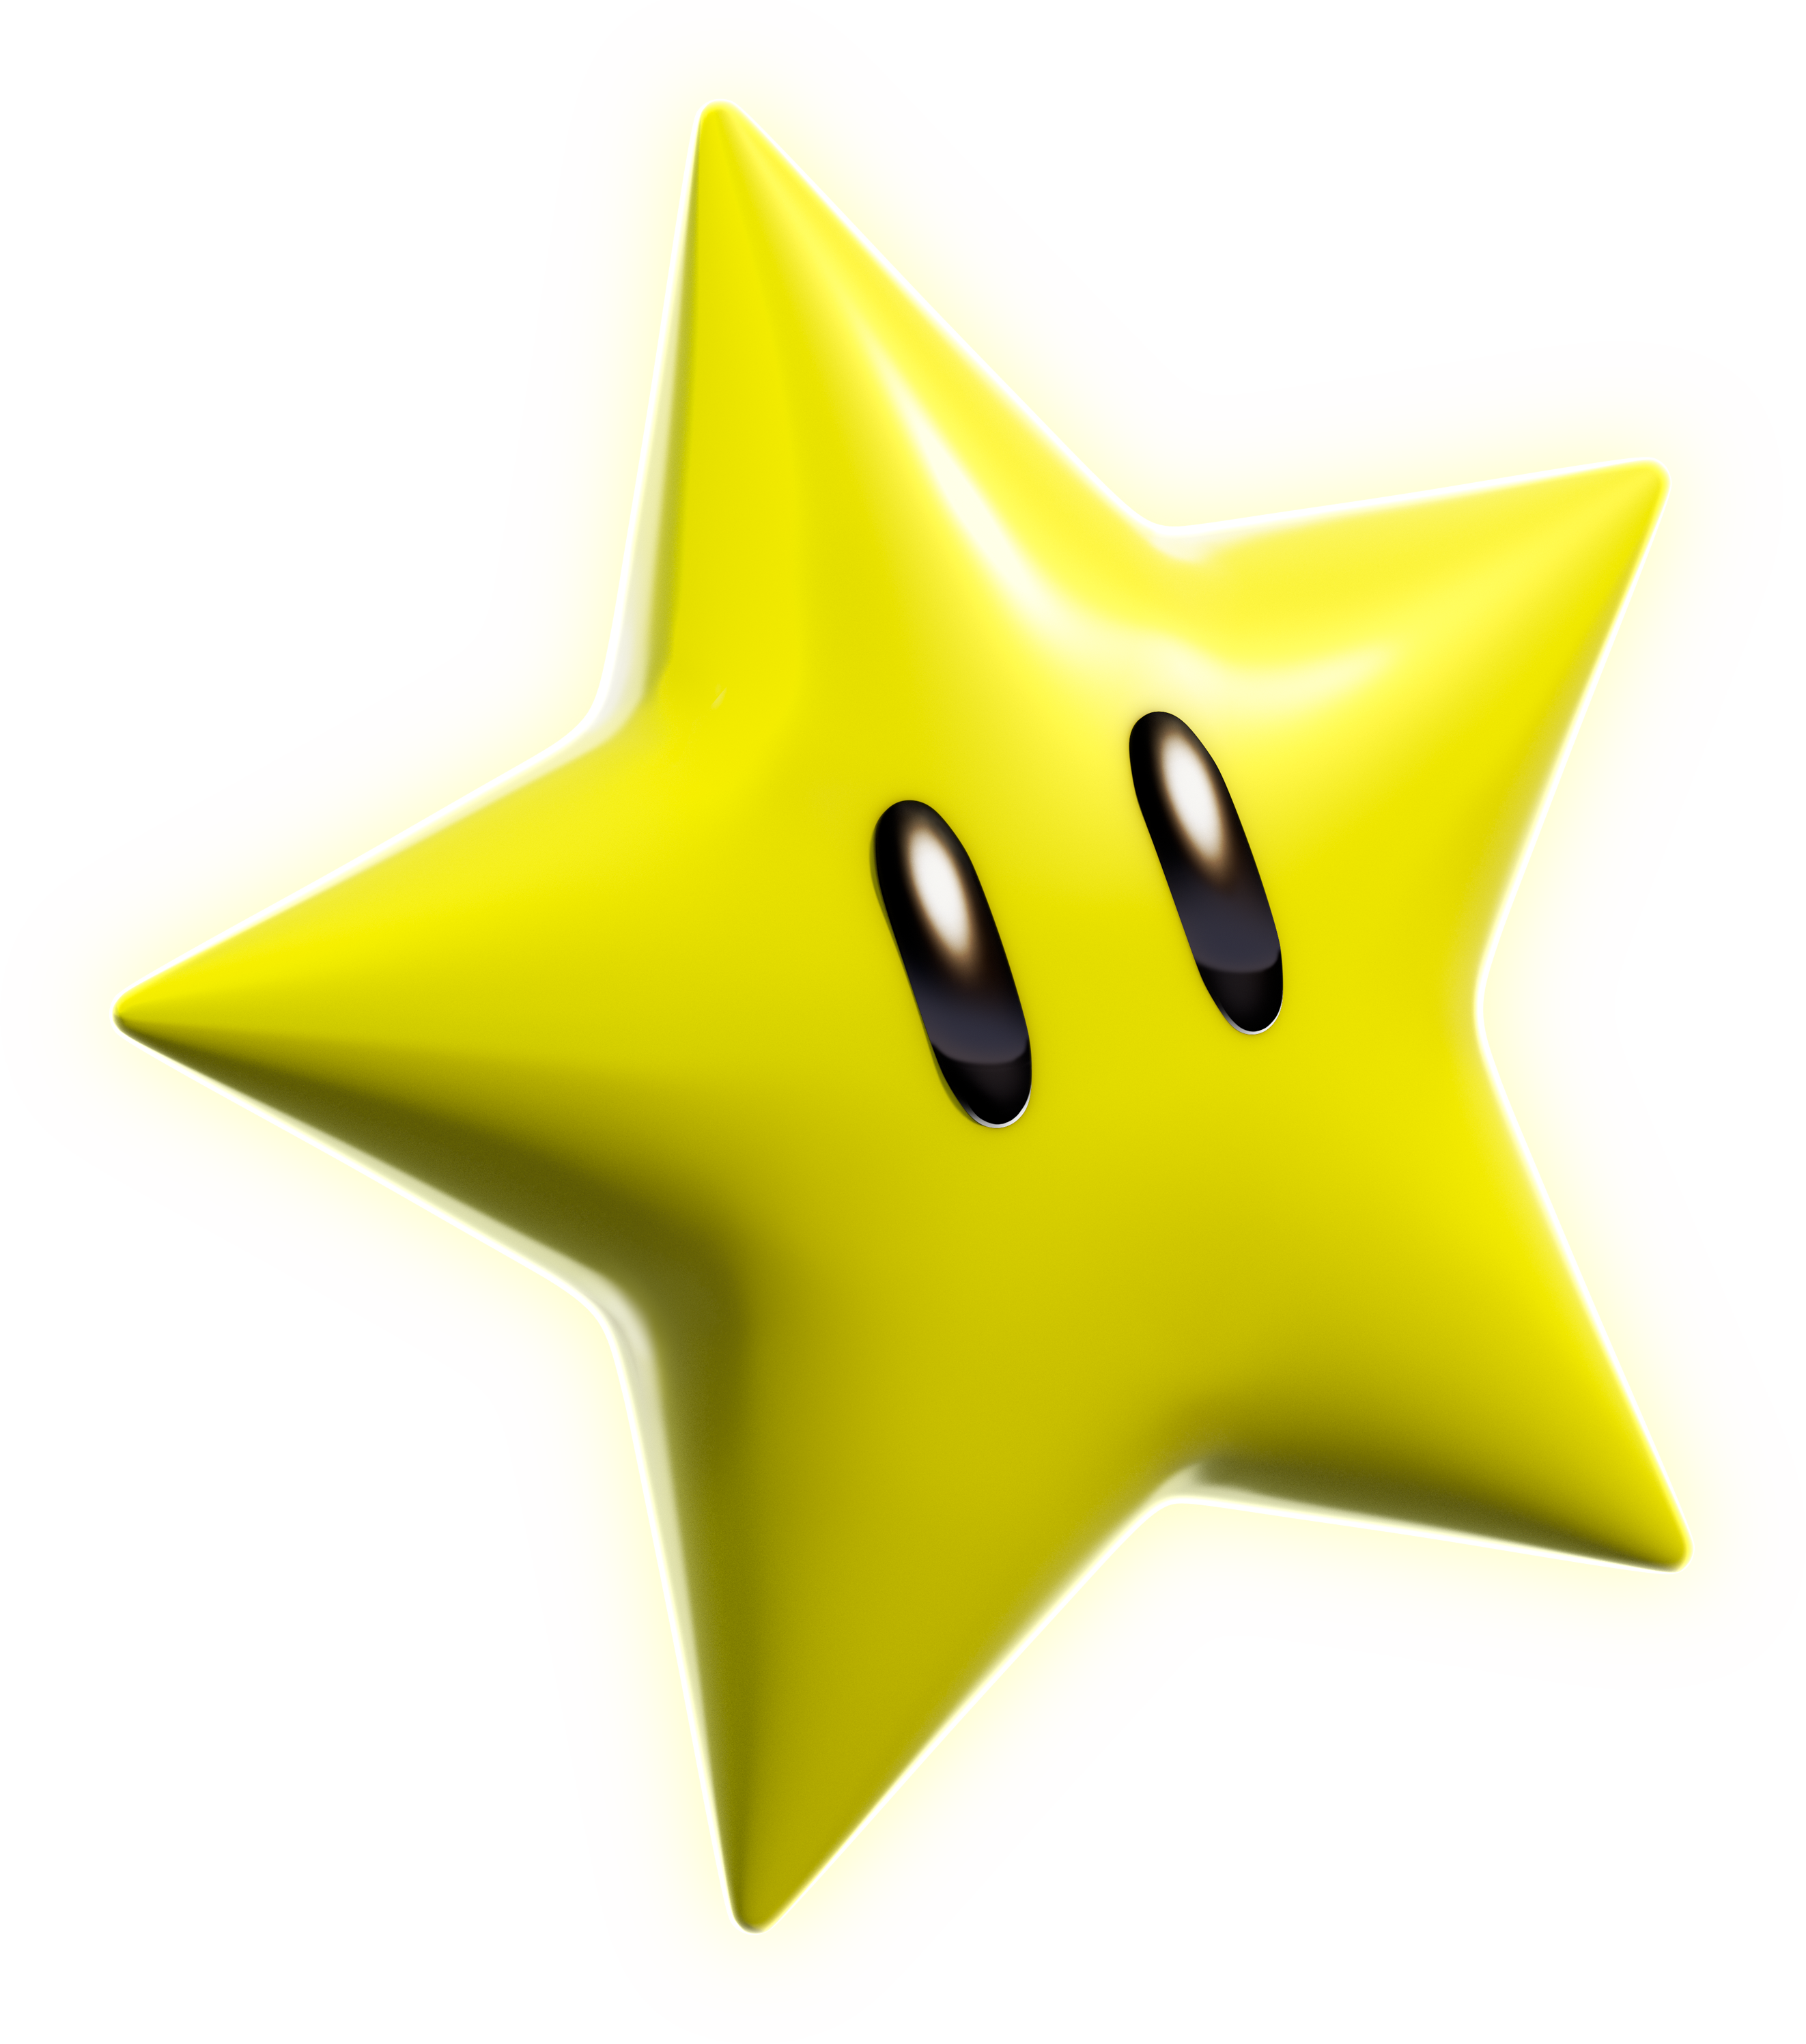 Mario star clipart png image freeuse stock My Super Mario Boy: Super Mario 3D World High Resolution Artwork image freeuse stock